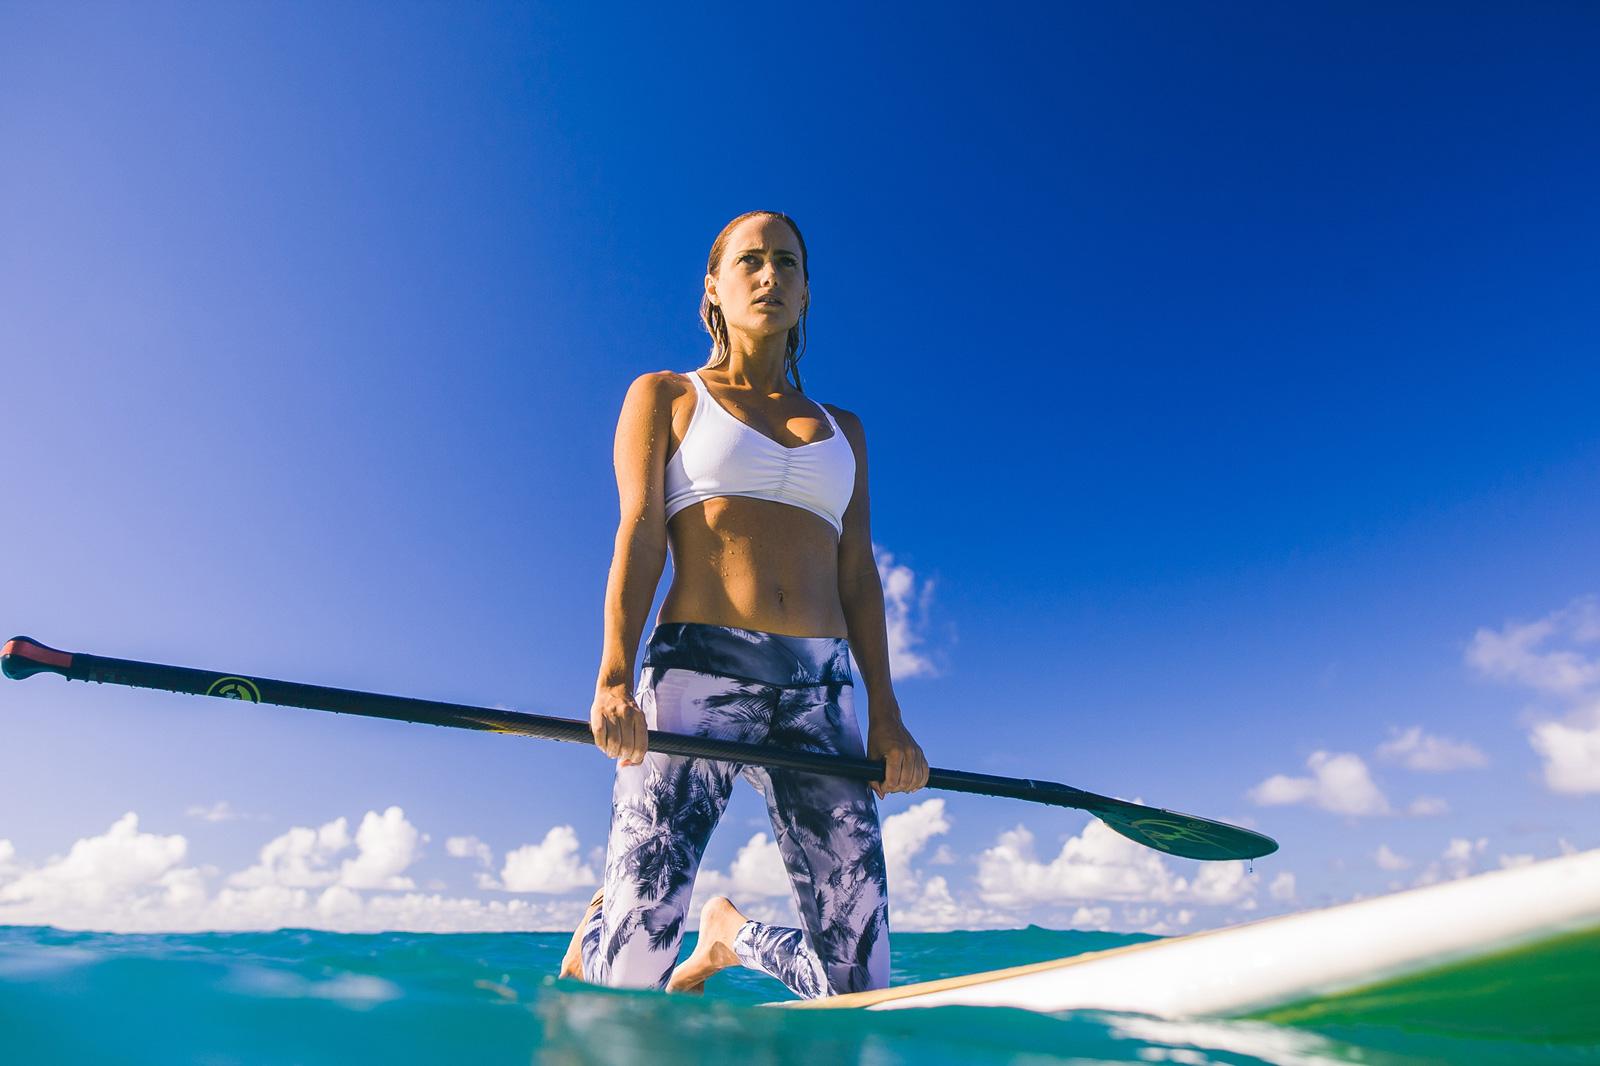 5 reasons to wear a legging for kiting - KiteSista